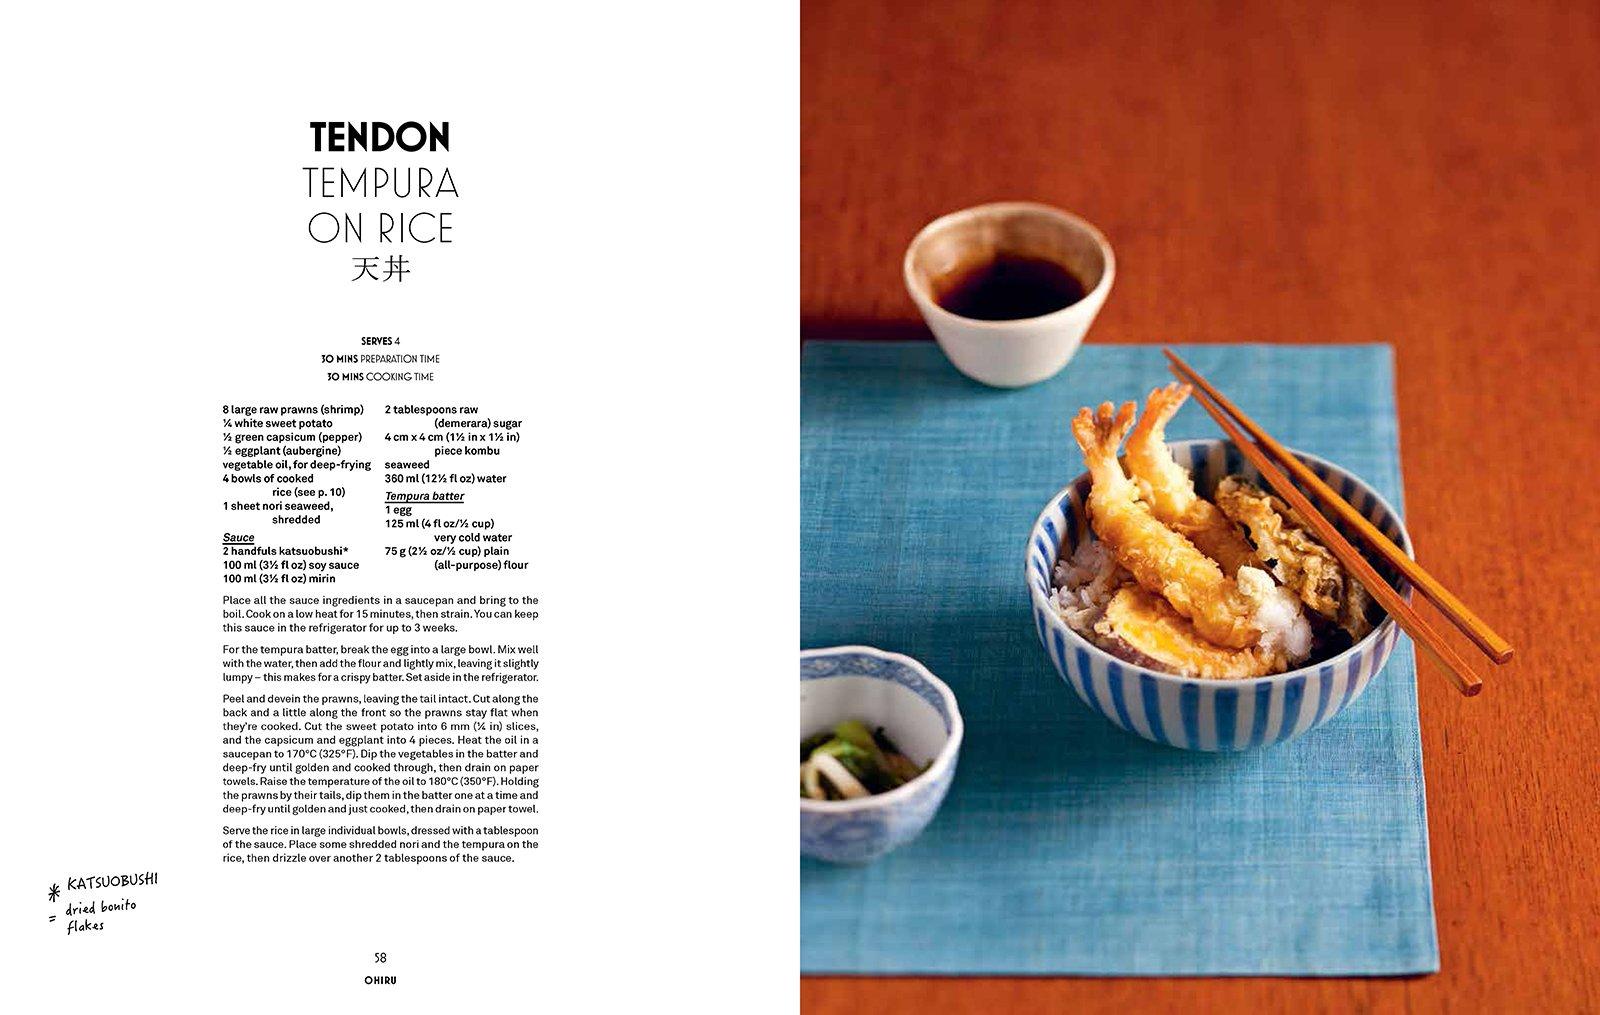 Tokyo cult recipes maori murota 9780062446688 amazon books forumfinder Image collections